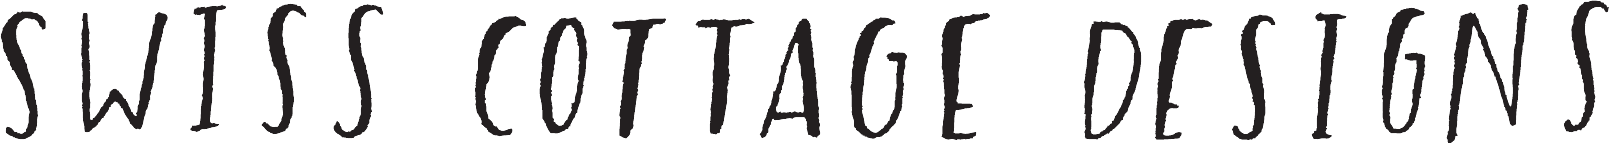 Swiss Cottage Designs Logo